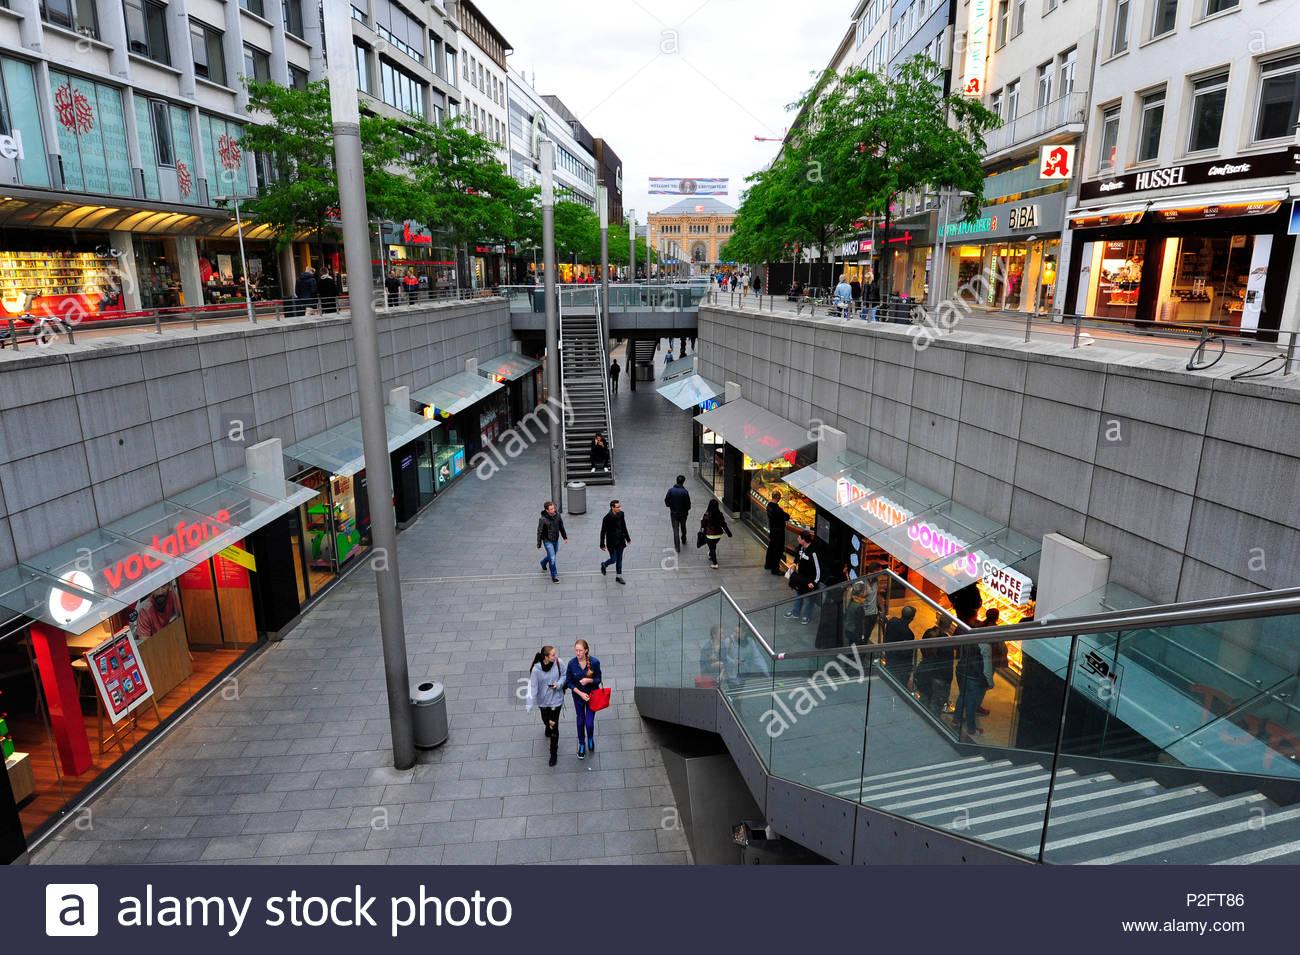 Shopping arcade, Niki-de-Saint-Phalle-Promenade, Bahnhofstrasse, Hanover, Hannover, Lower Saxony, Germany - Stock Image